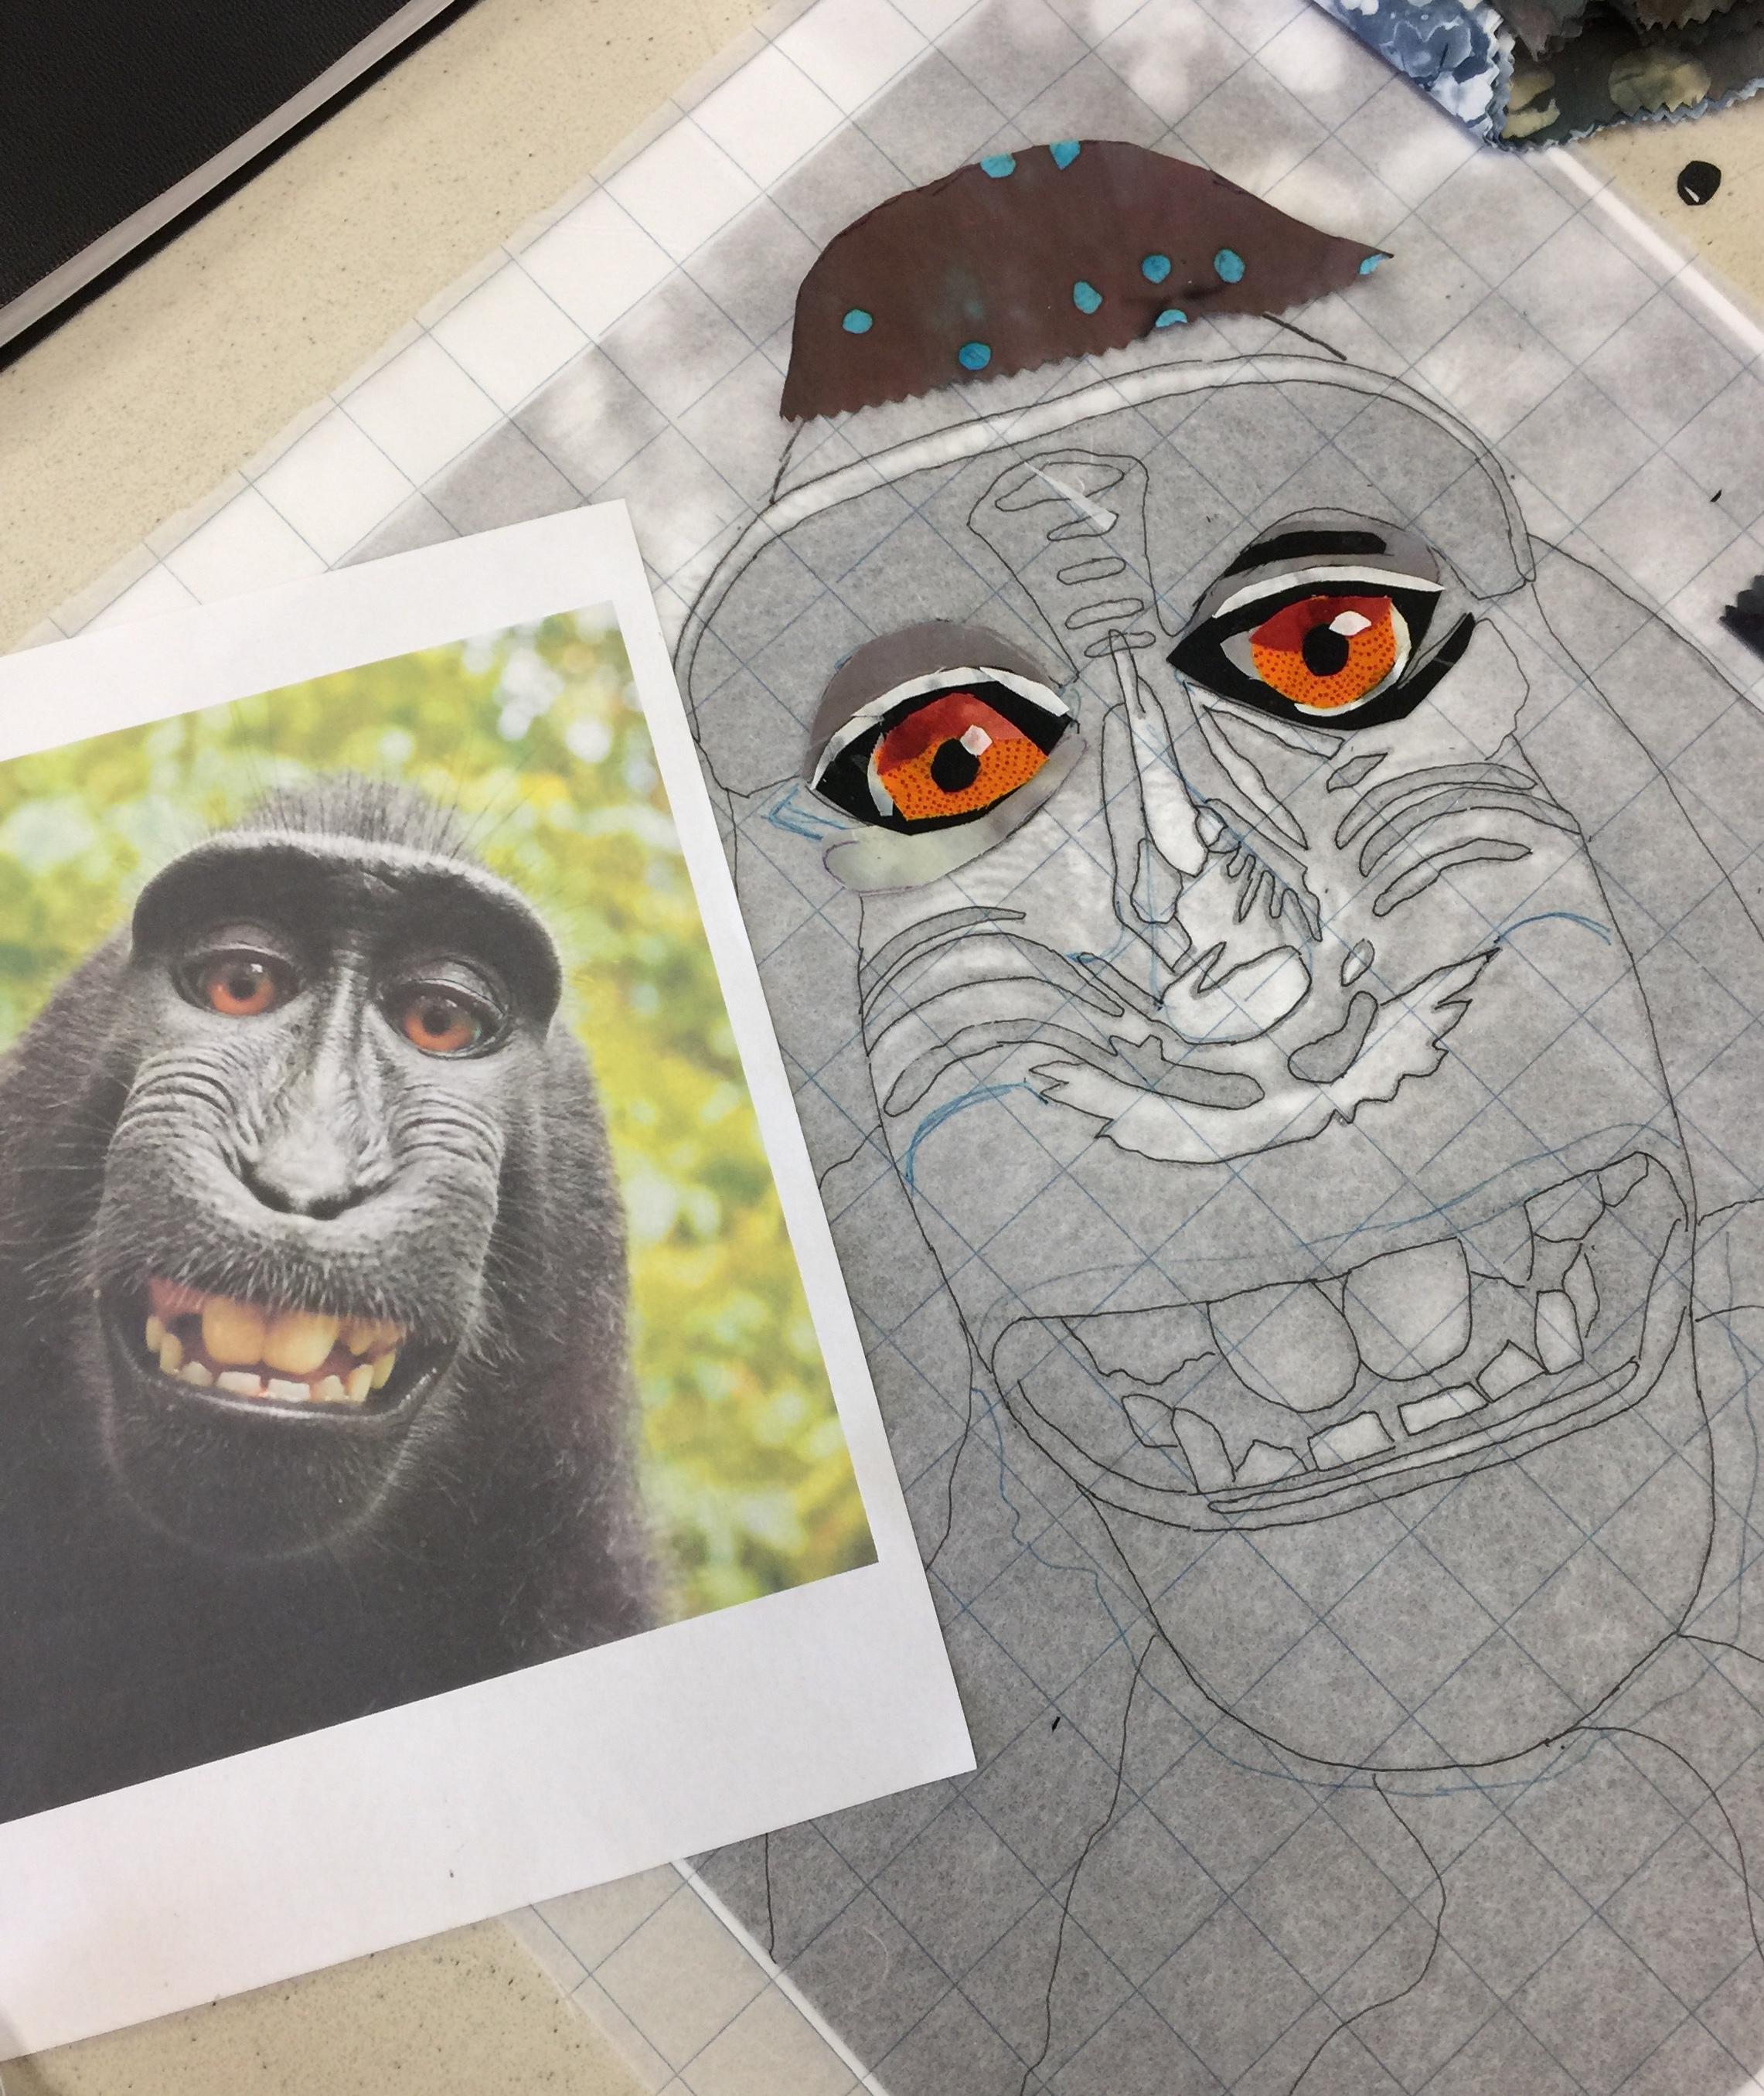 Work starting on the monkey portrait